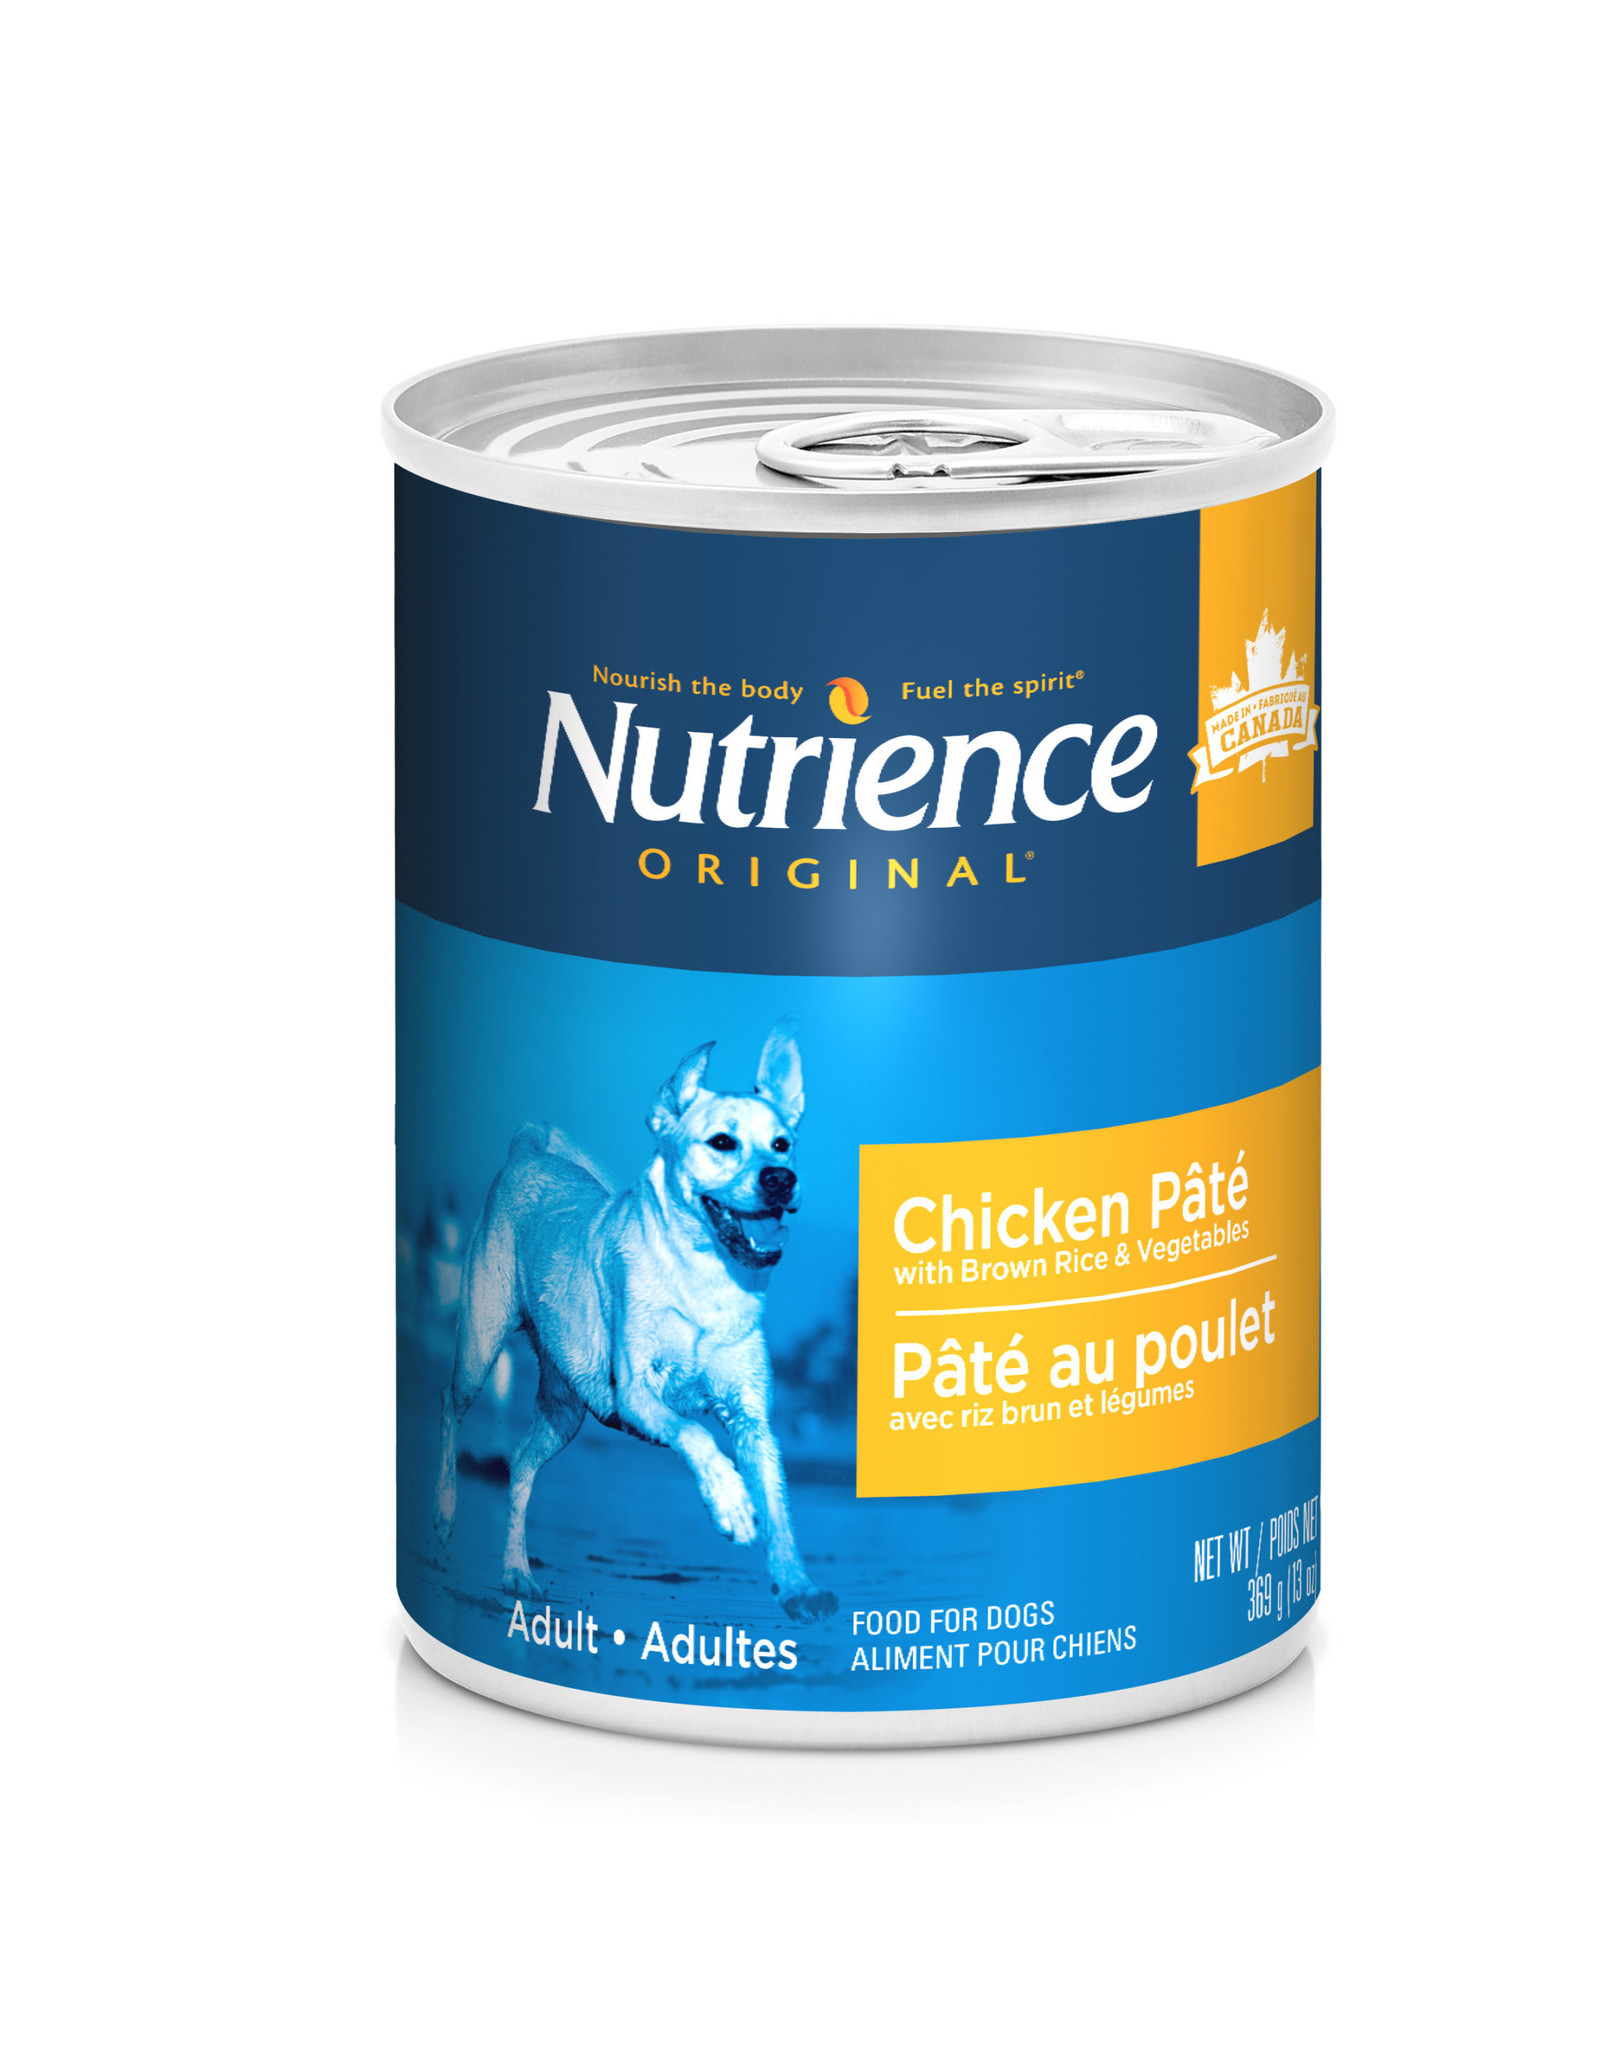 Nutrience Nutrience Original Chicken Pate with Brown Rice & Vegetables - 369g